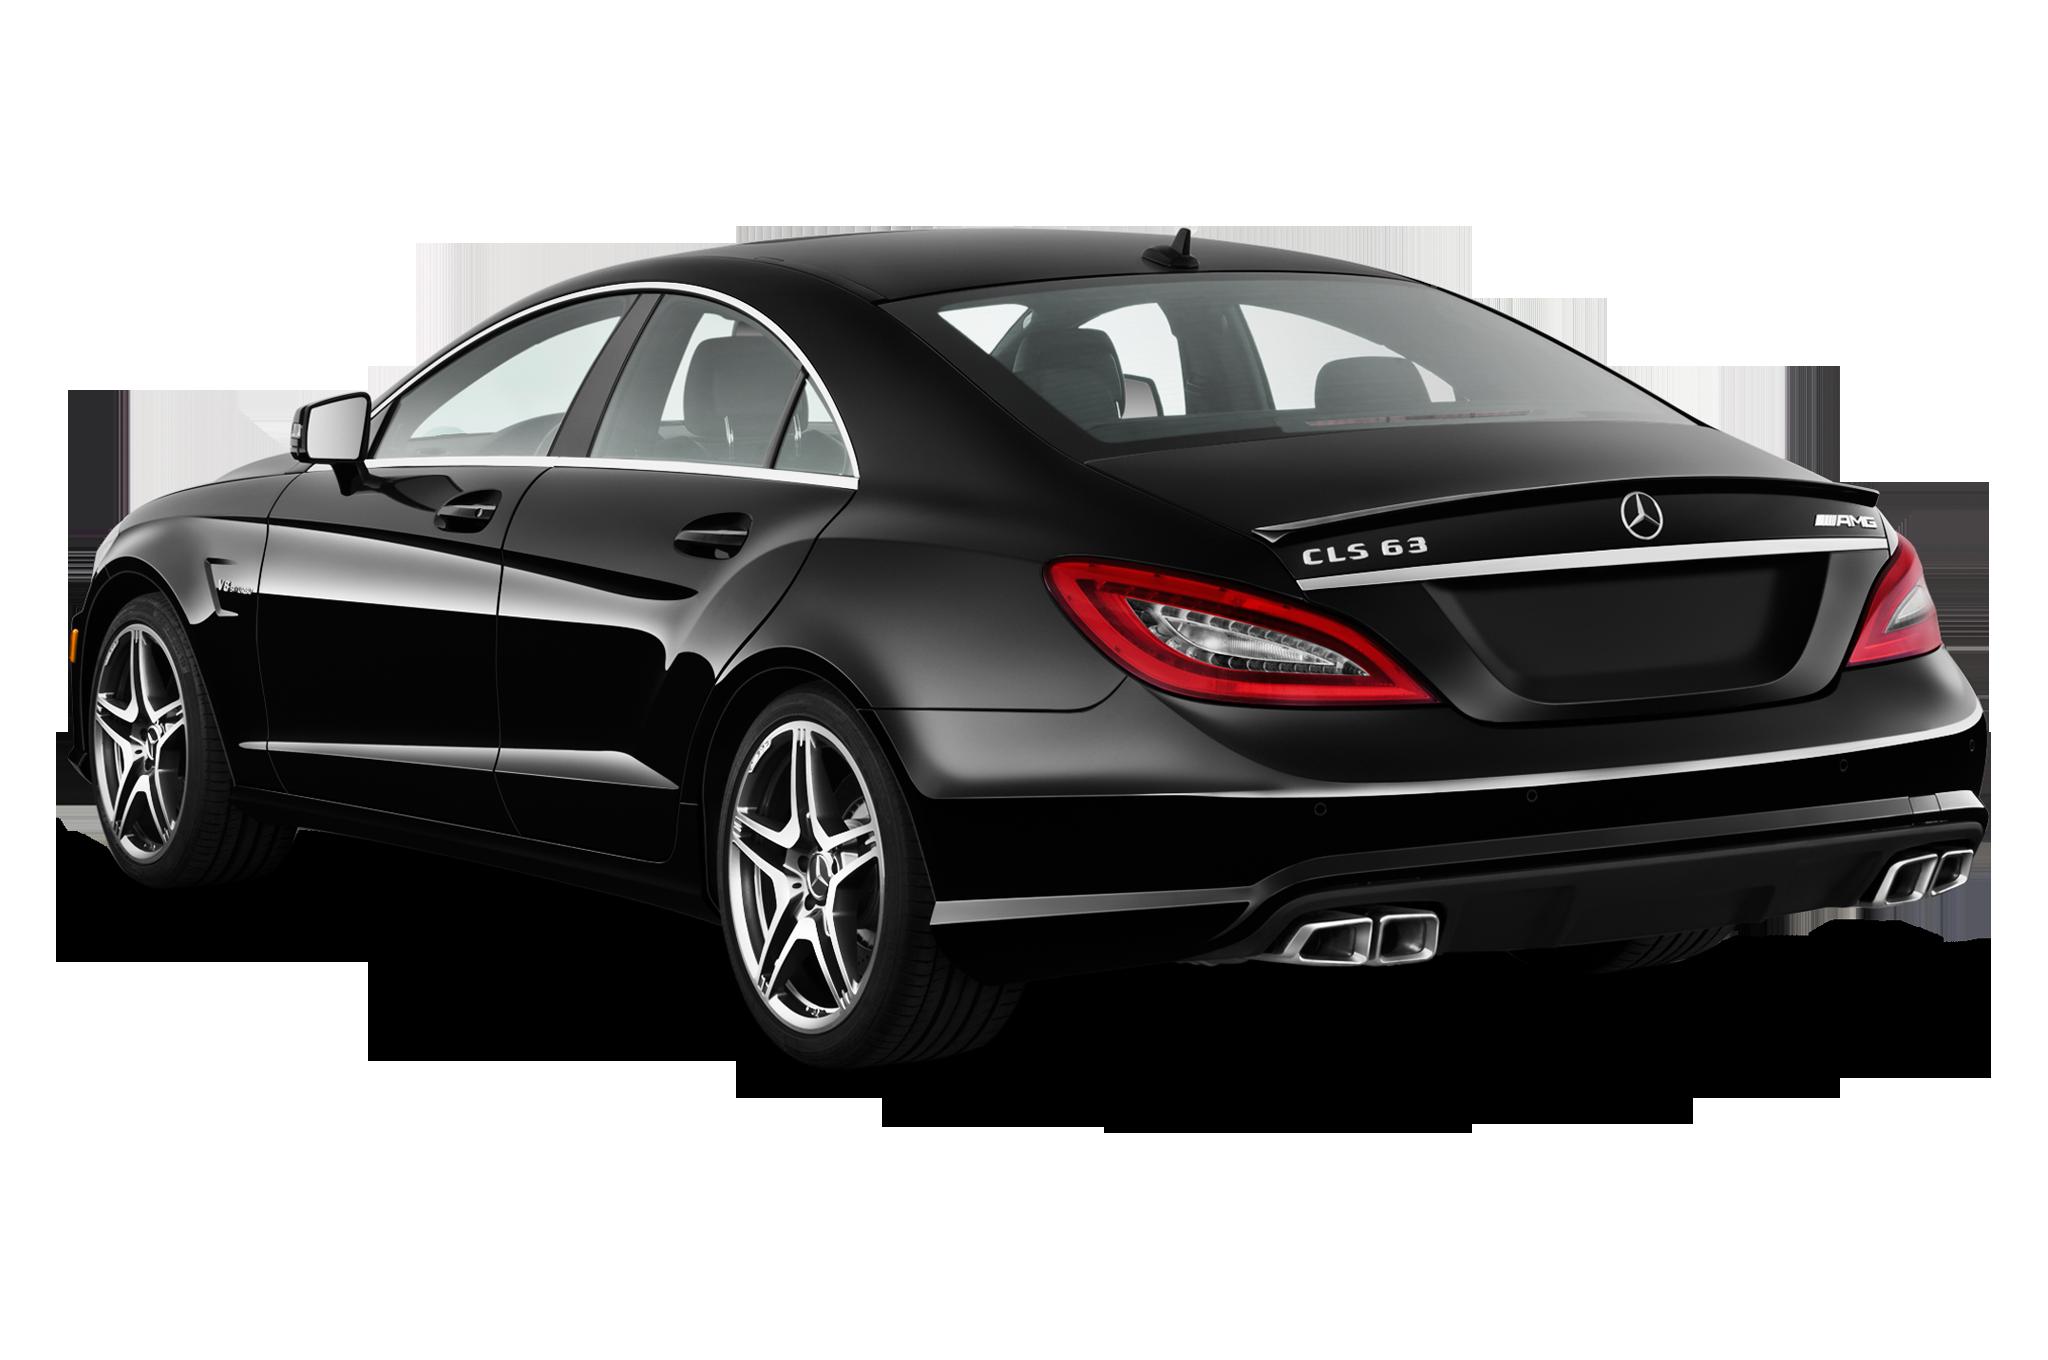 2015 mercedes benz cls class facelift spied automobile. Black Bedroom Furniture Sets. Home Design Ideas